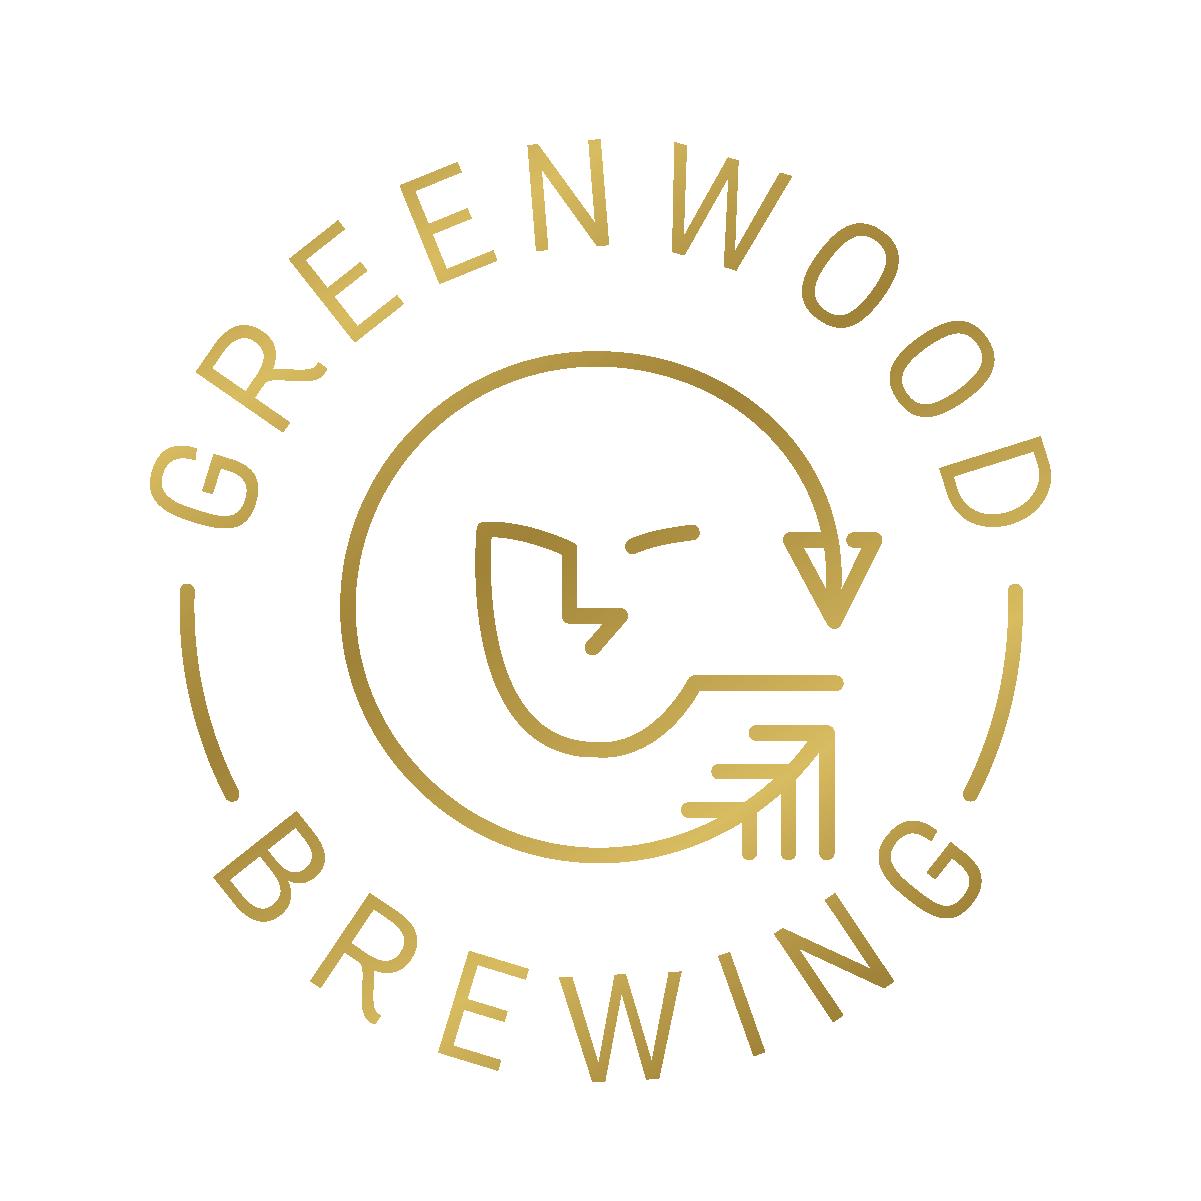 Woman-owned Brewery in Phoenix, Arizona